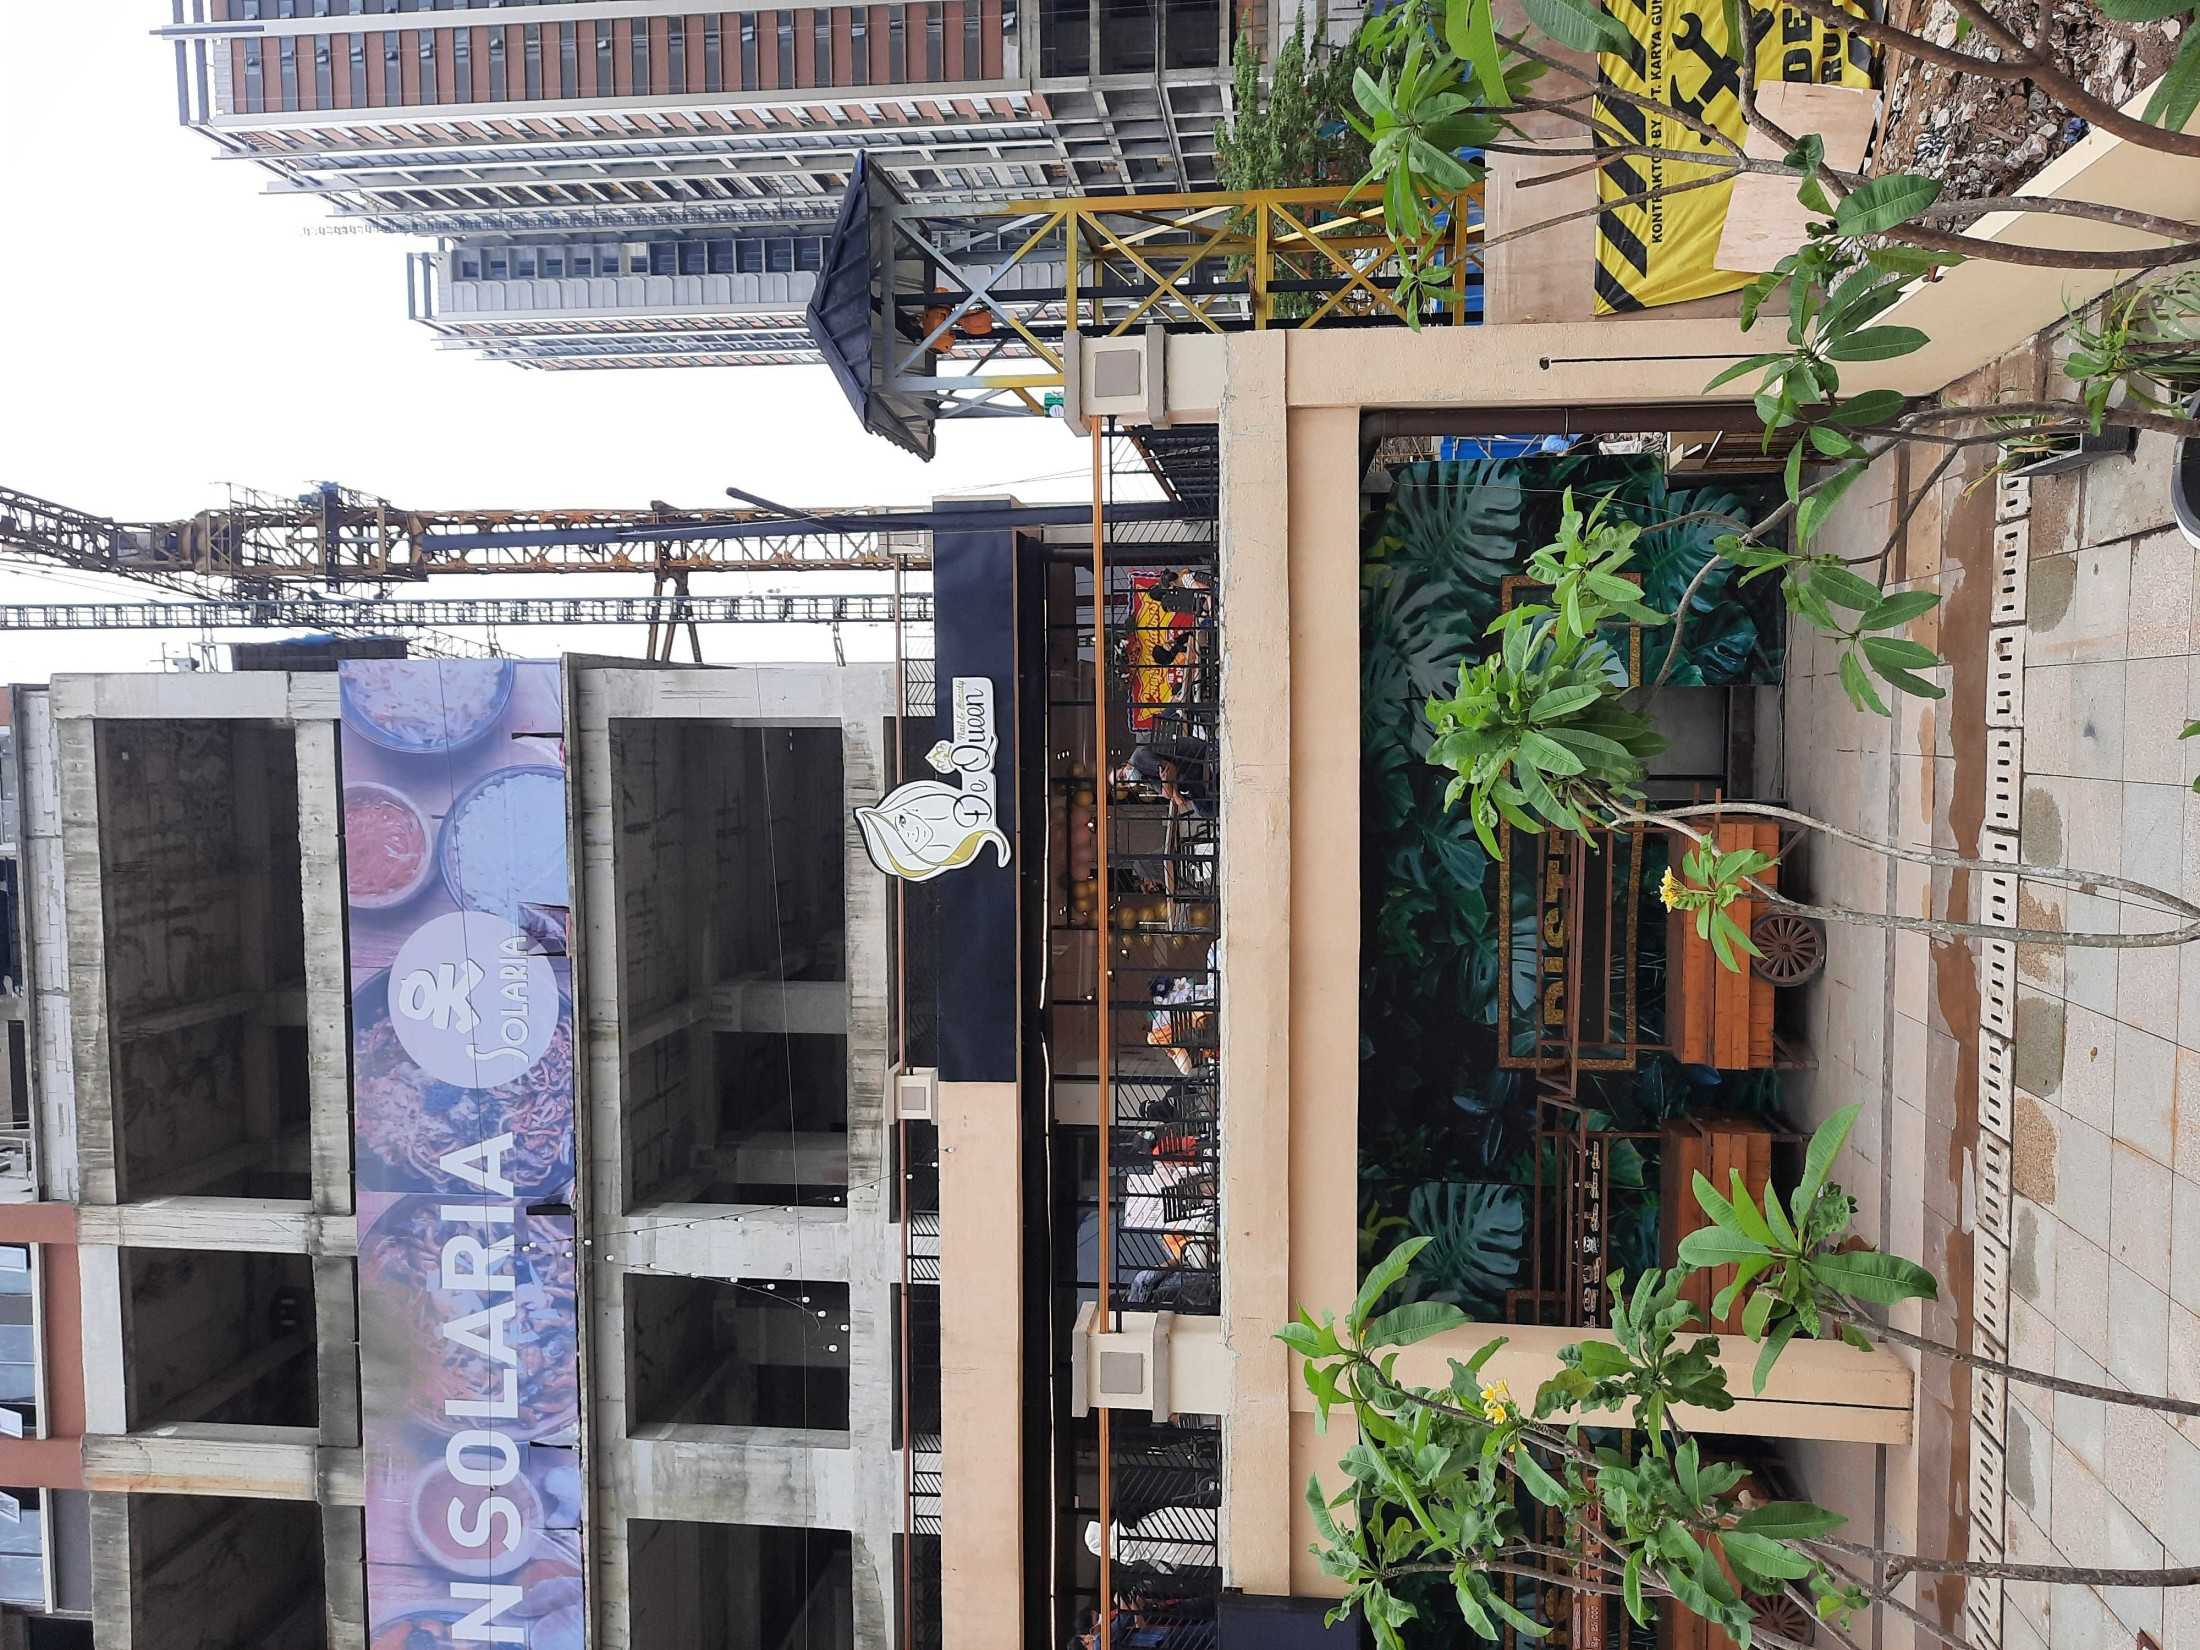 Spasilab Renovasi Outlet - The Queen Jl. Orange County Boulevard, Cibatu, Cikarang Sel., Bekasi, Jawa Barat 17530, Indonesia Jl. Orange County Boulevard, Cibatu, Cikarang Sel., Bekasi, Jawa Barat 17530, Indonesia Spasilab-Renovasi-Outlet-The-Queen  103414